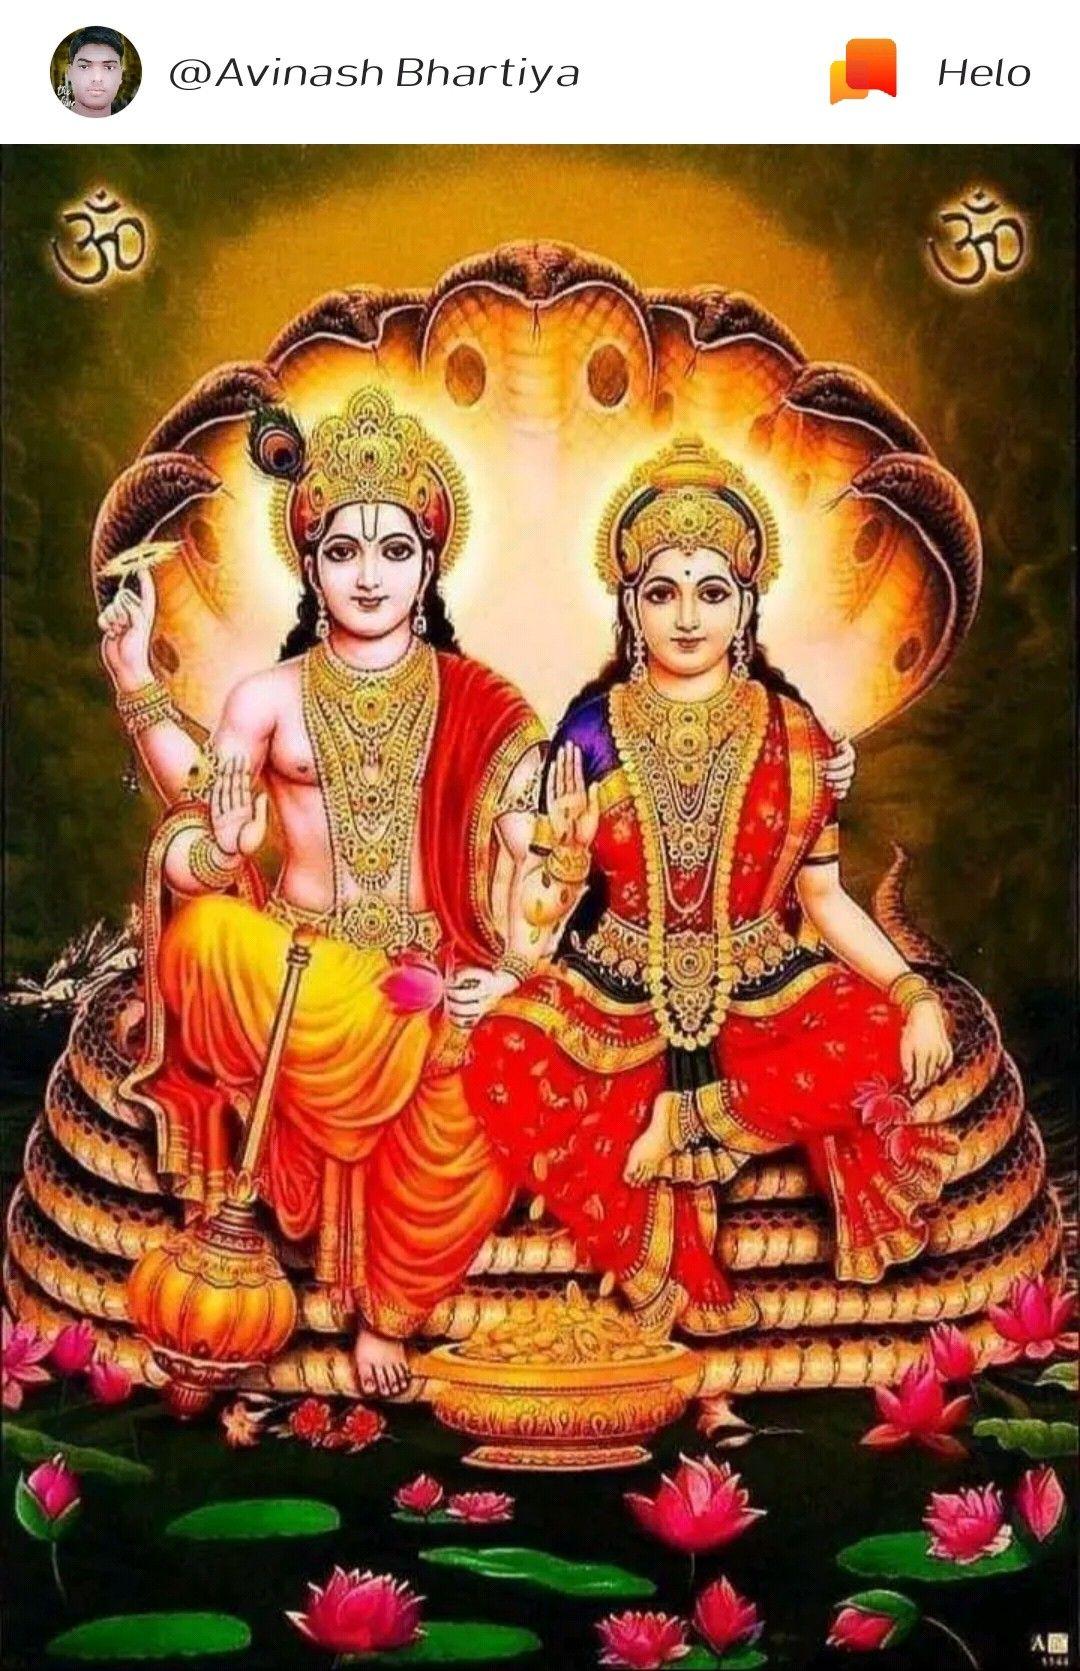 Laxmi Narayan Lord Vishnu Wallpapers Lord Krishna Images Hindu Deities